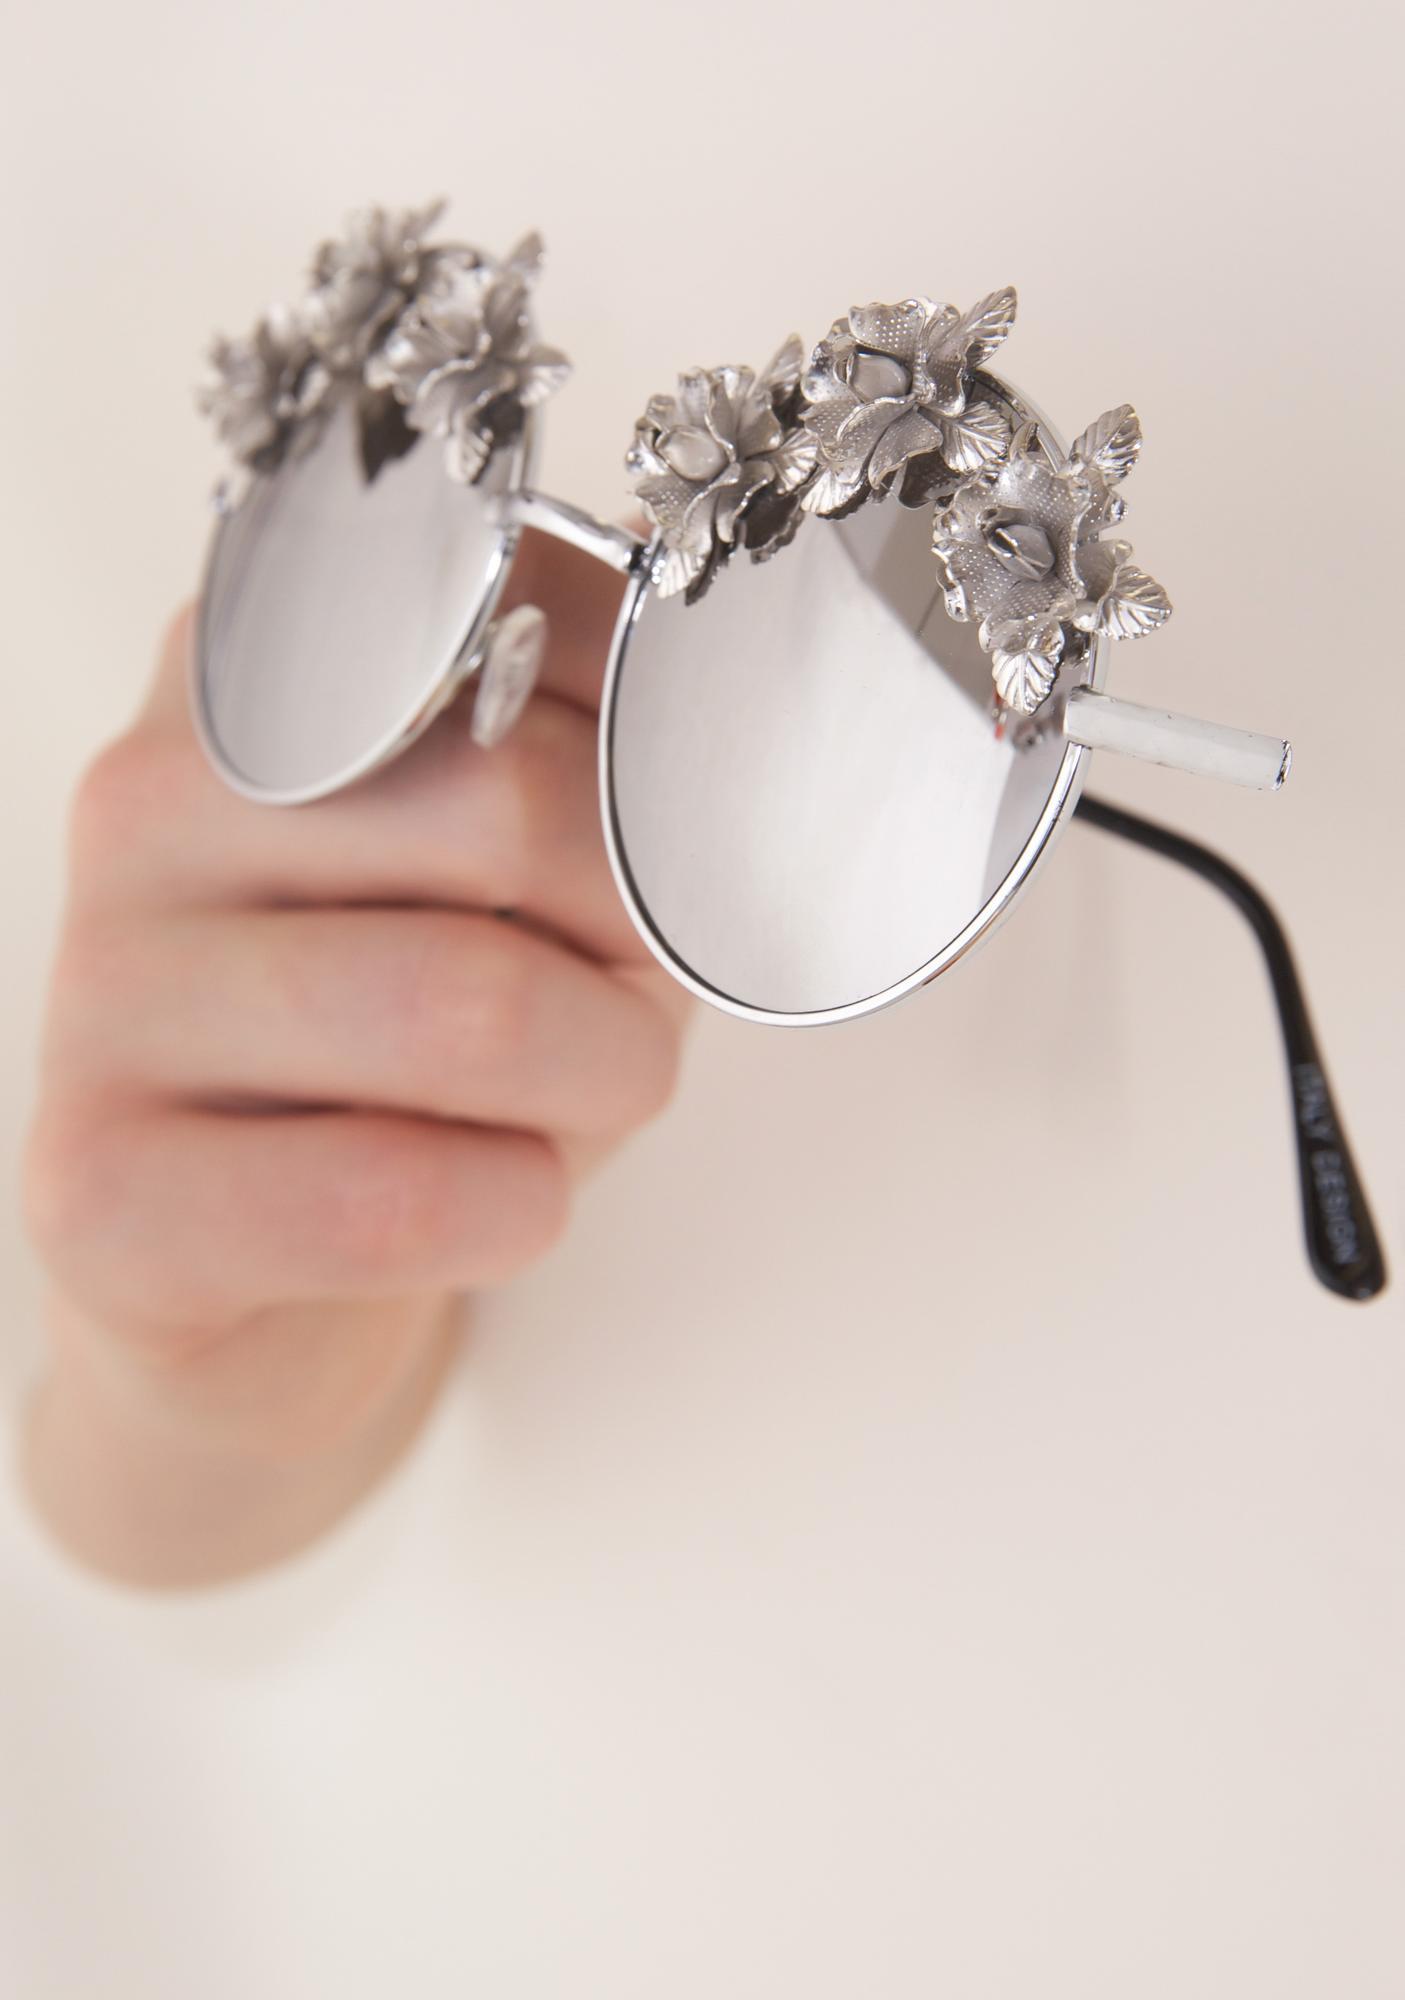 Tnemnroda Ice Princess Sunglasses